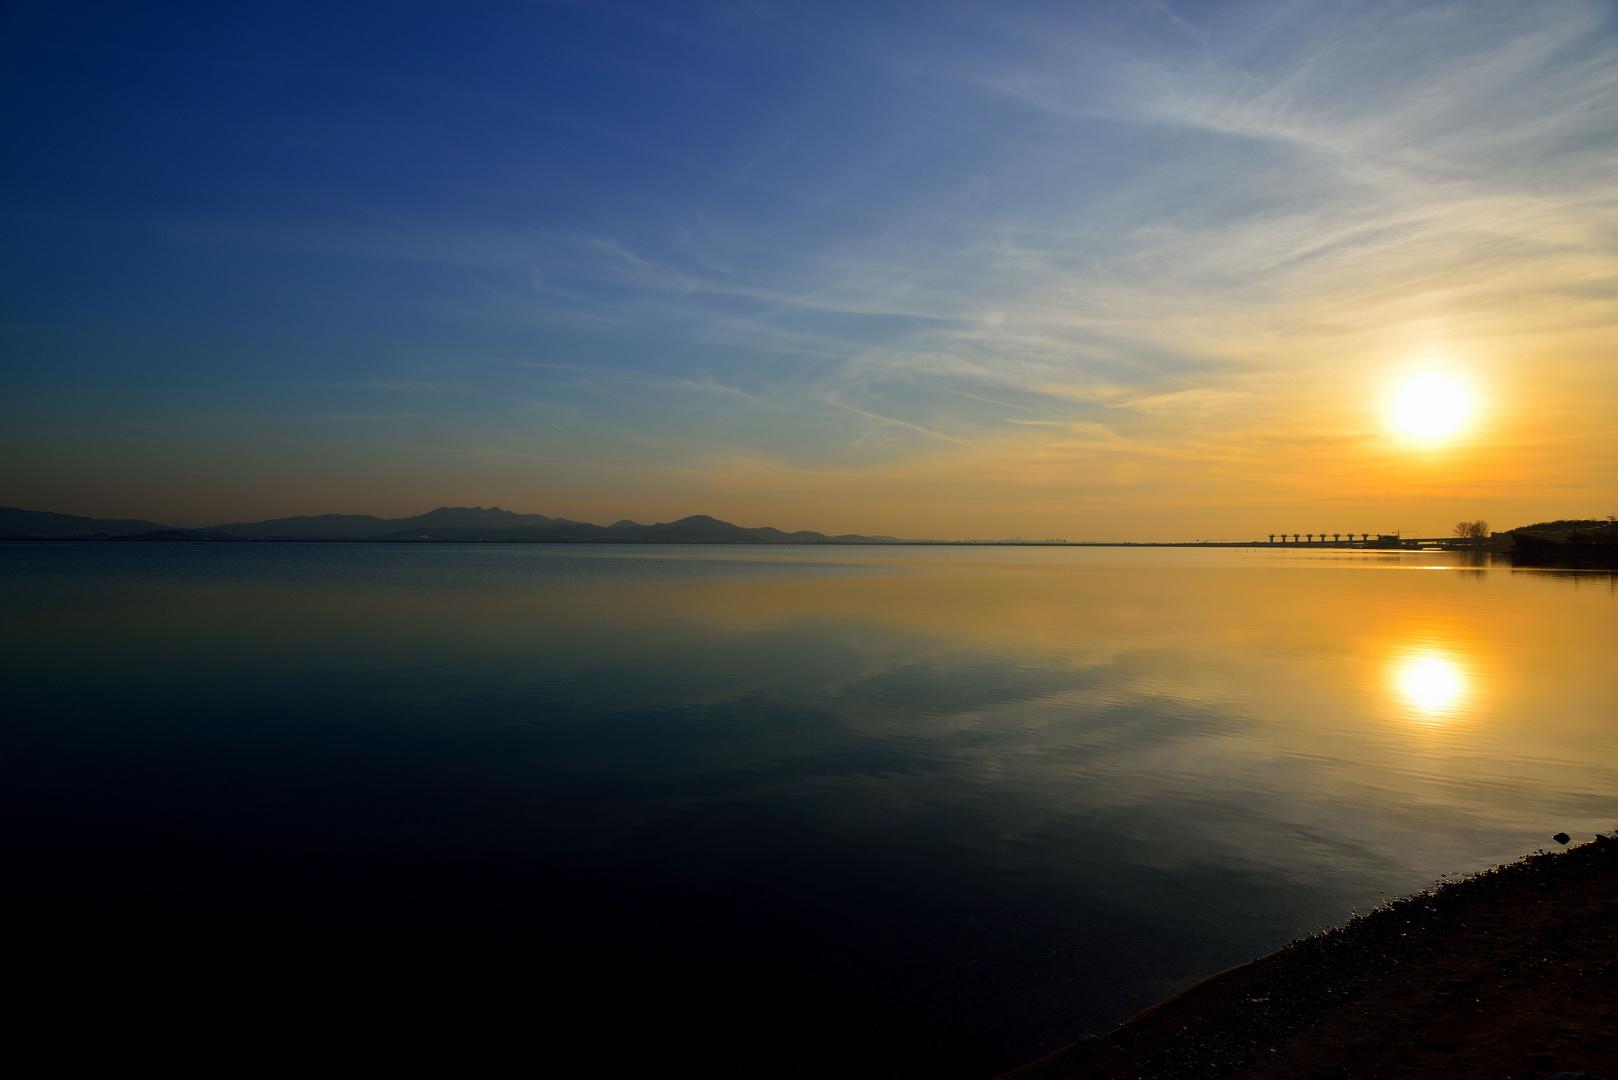 Sonnenuntergang am Asanho Lake